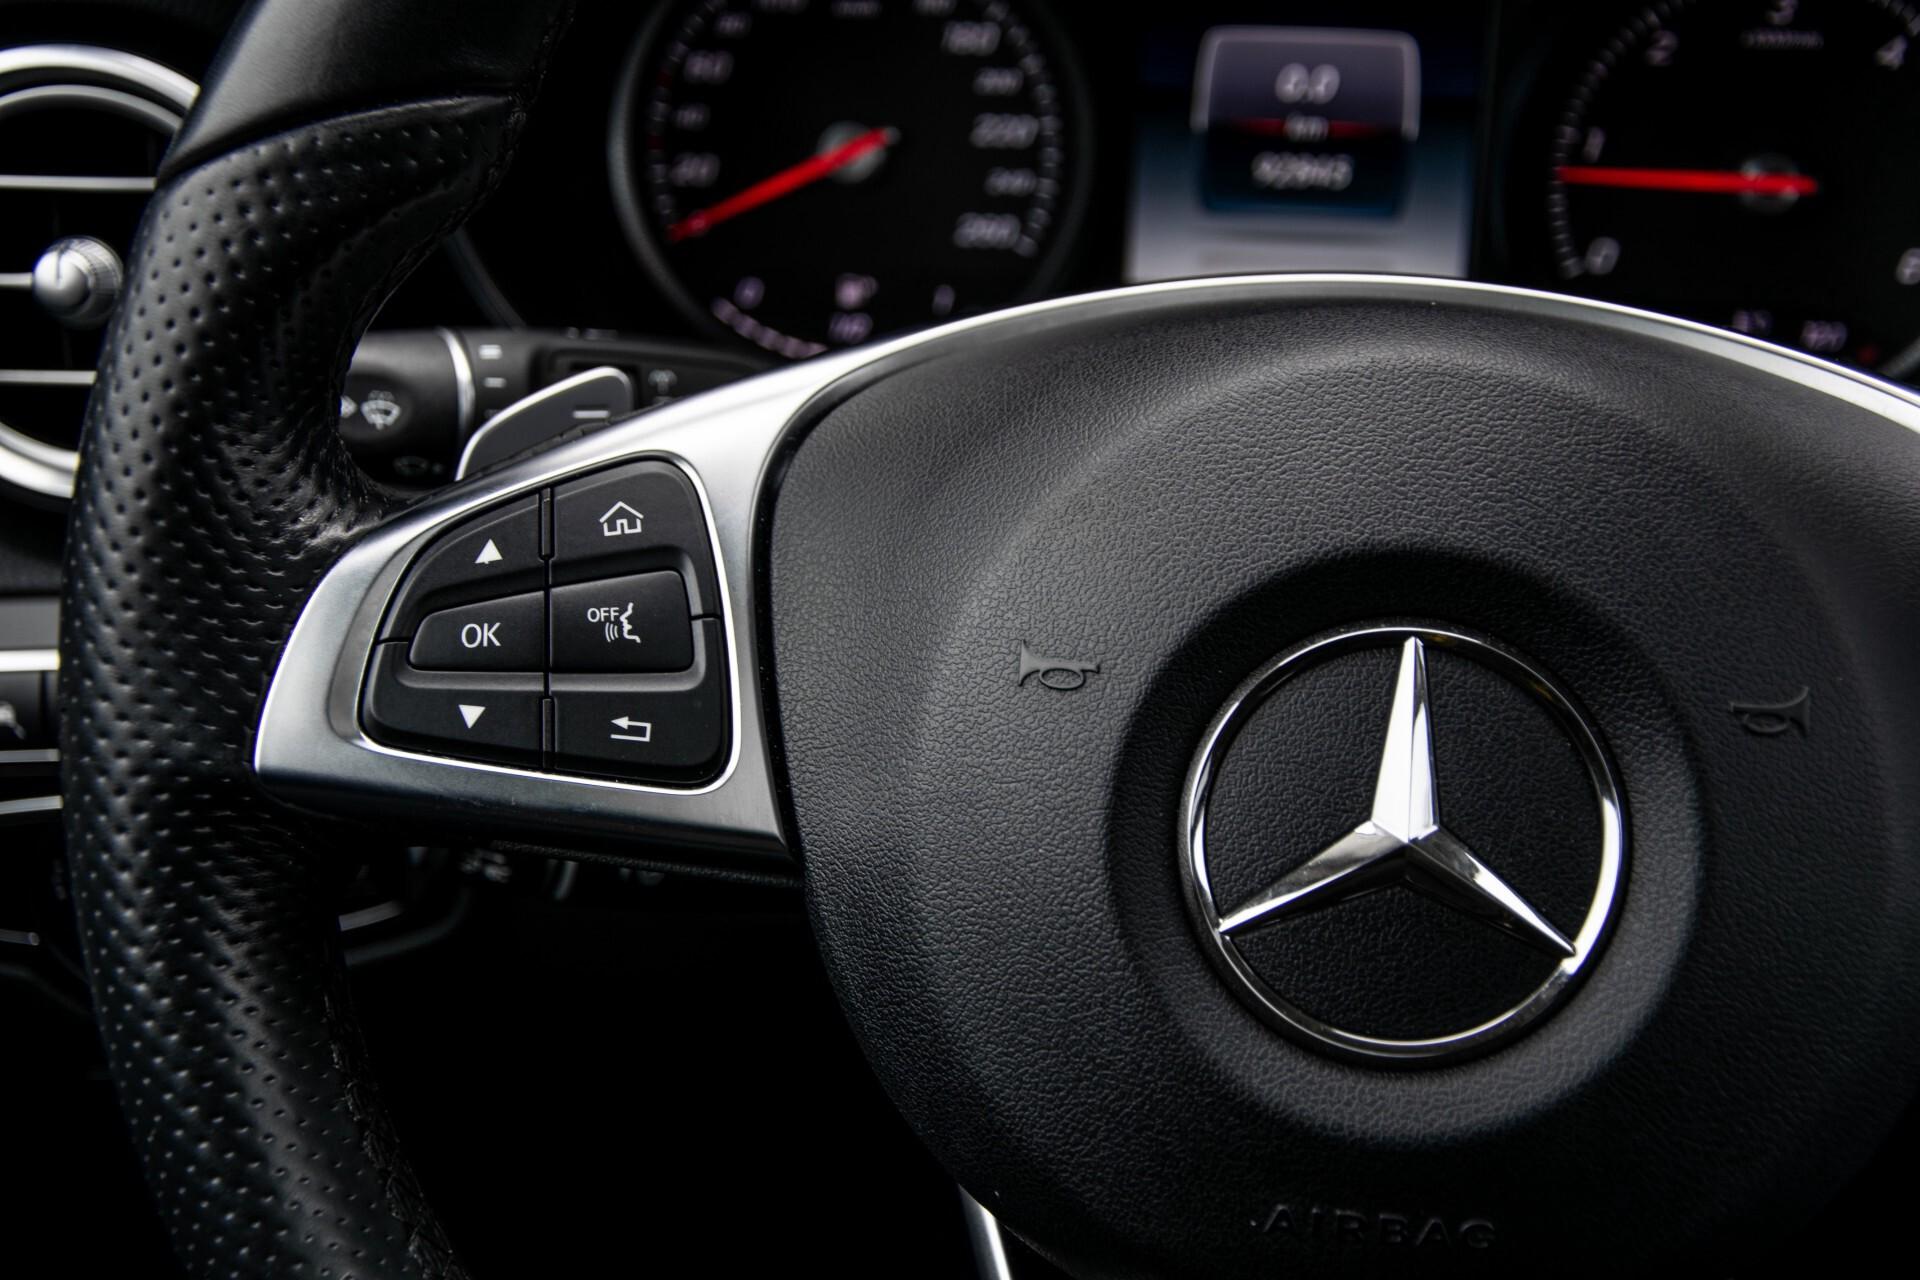 Mercedes-Benz GLC 220 d 4-M AMG/Distronic/Panorama/Comand/HUD/Afn-Trhk Aut9 Foto 9